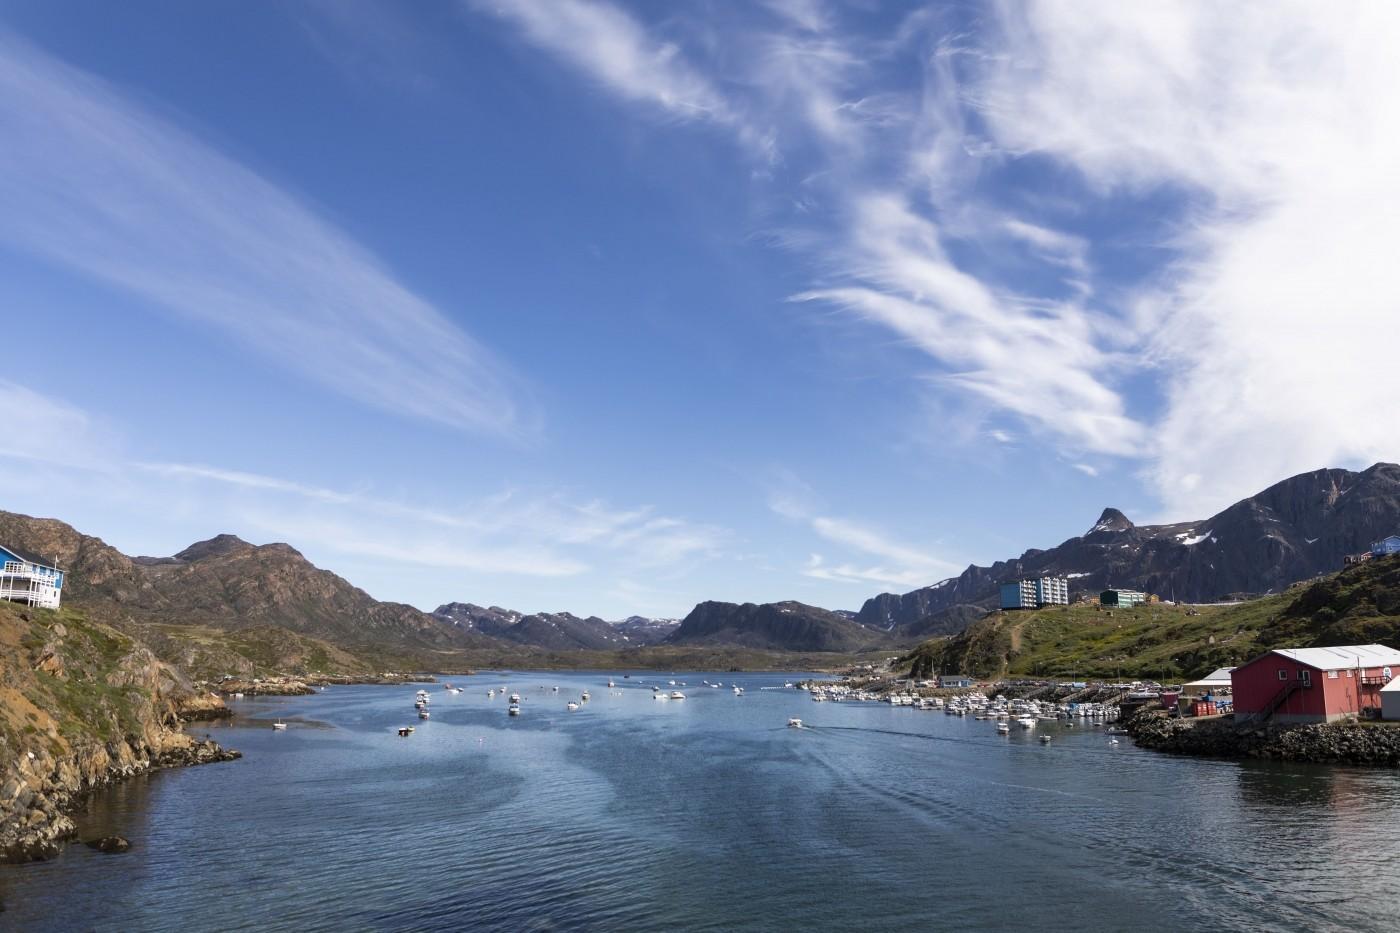 On the bridge towards Ulkebugten. Photo by Aningaaq R Carlsen - Visit Greenland